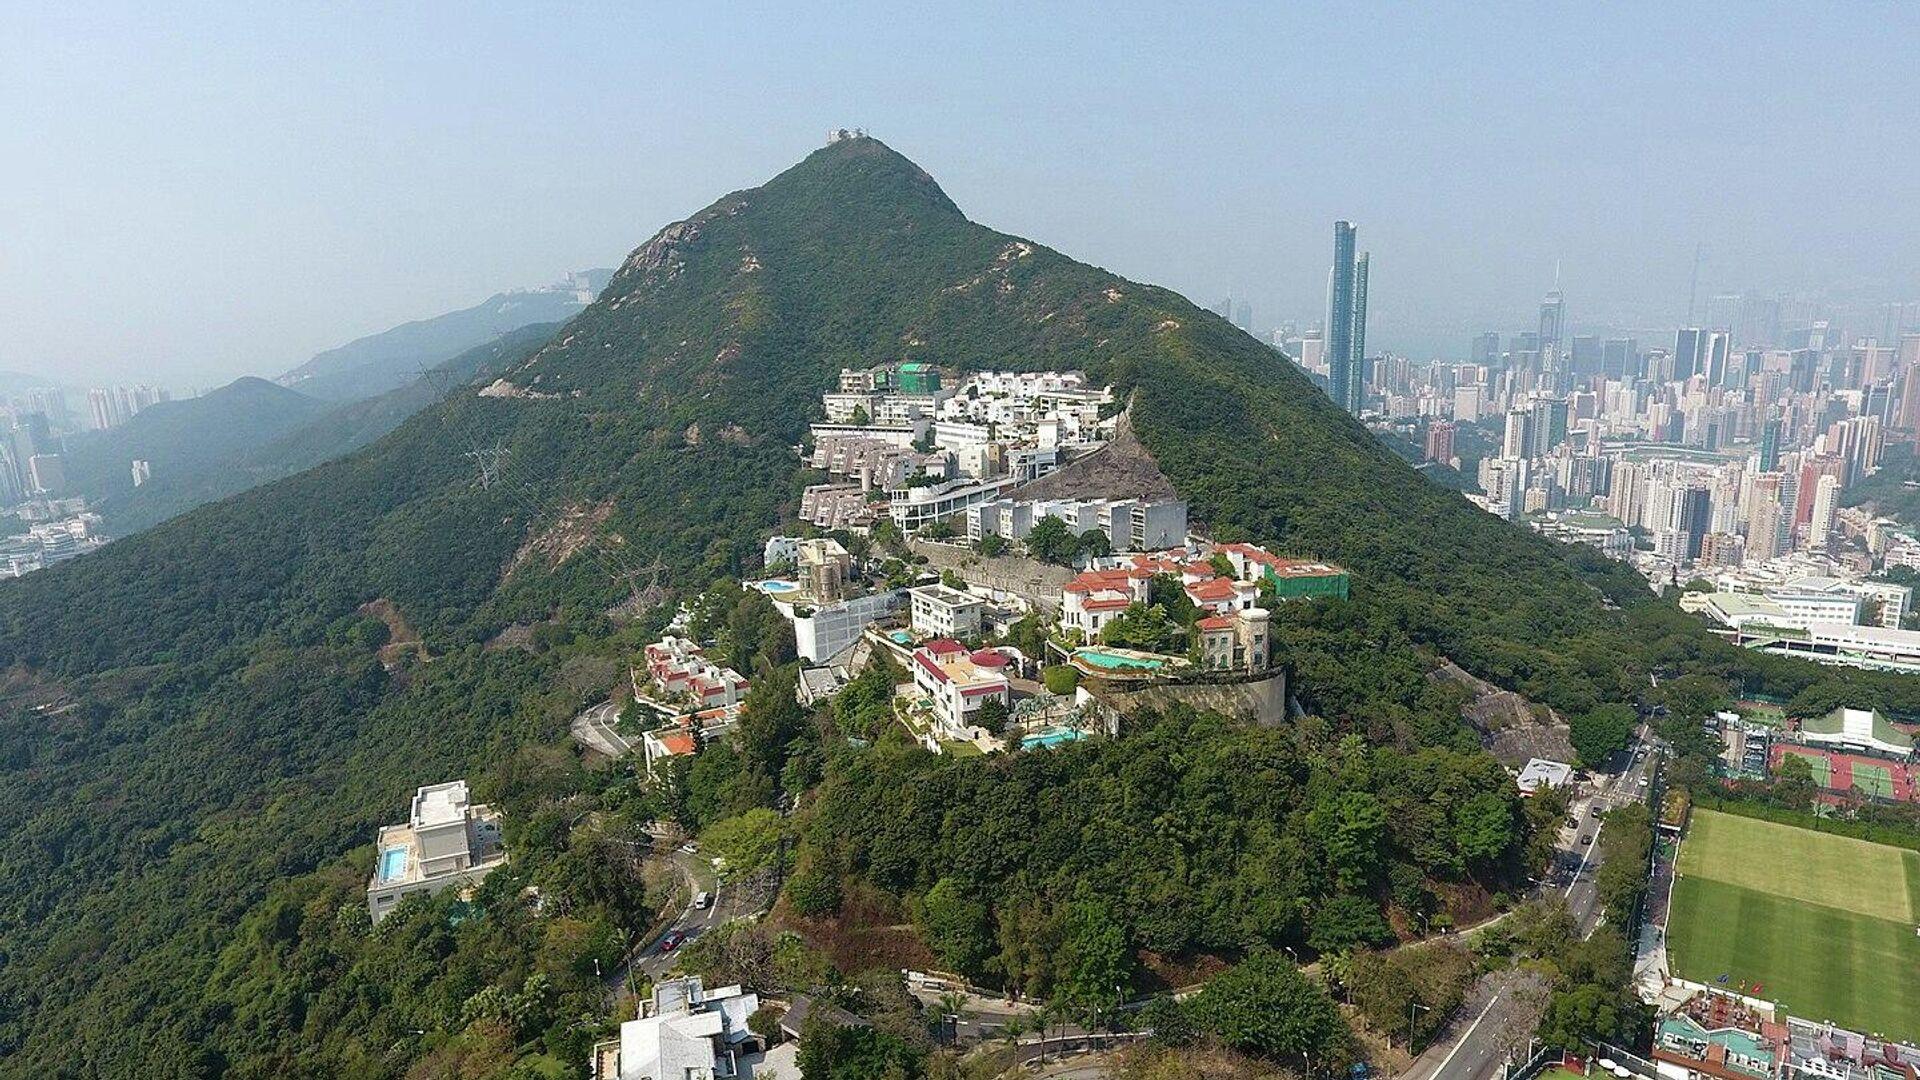 Mount Nicholson, Hong Kong - Sputnik Mundo, 1920, 07.06.2021